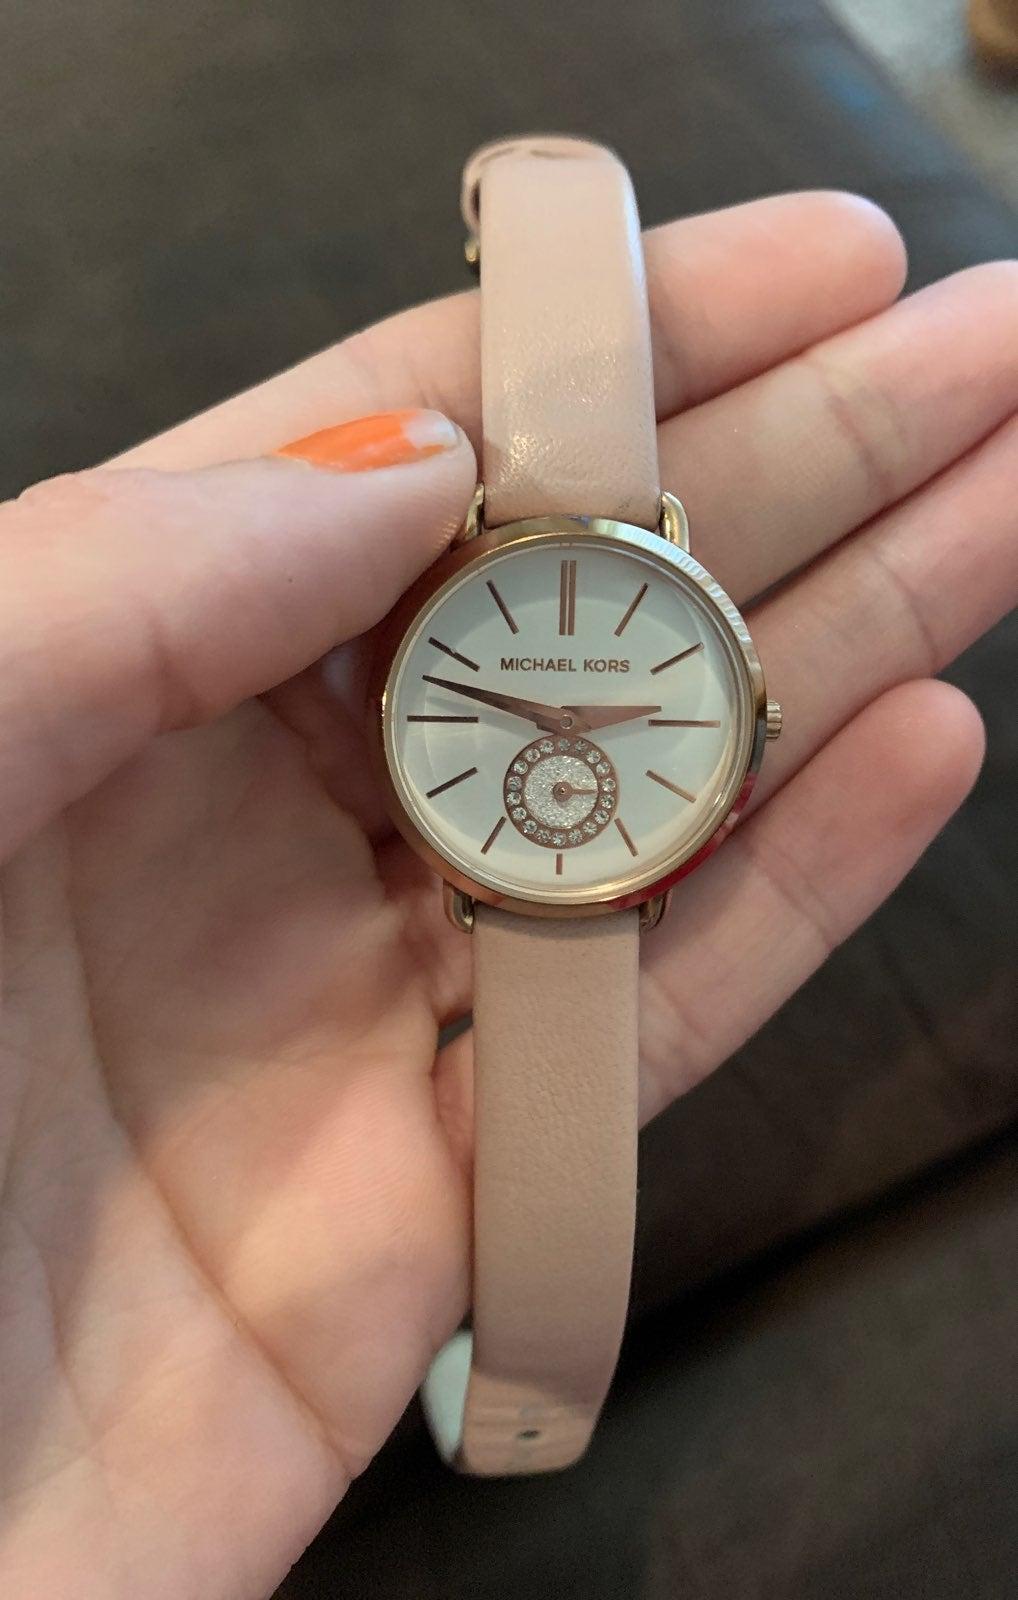 Micheal kors pastel pink watch